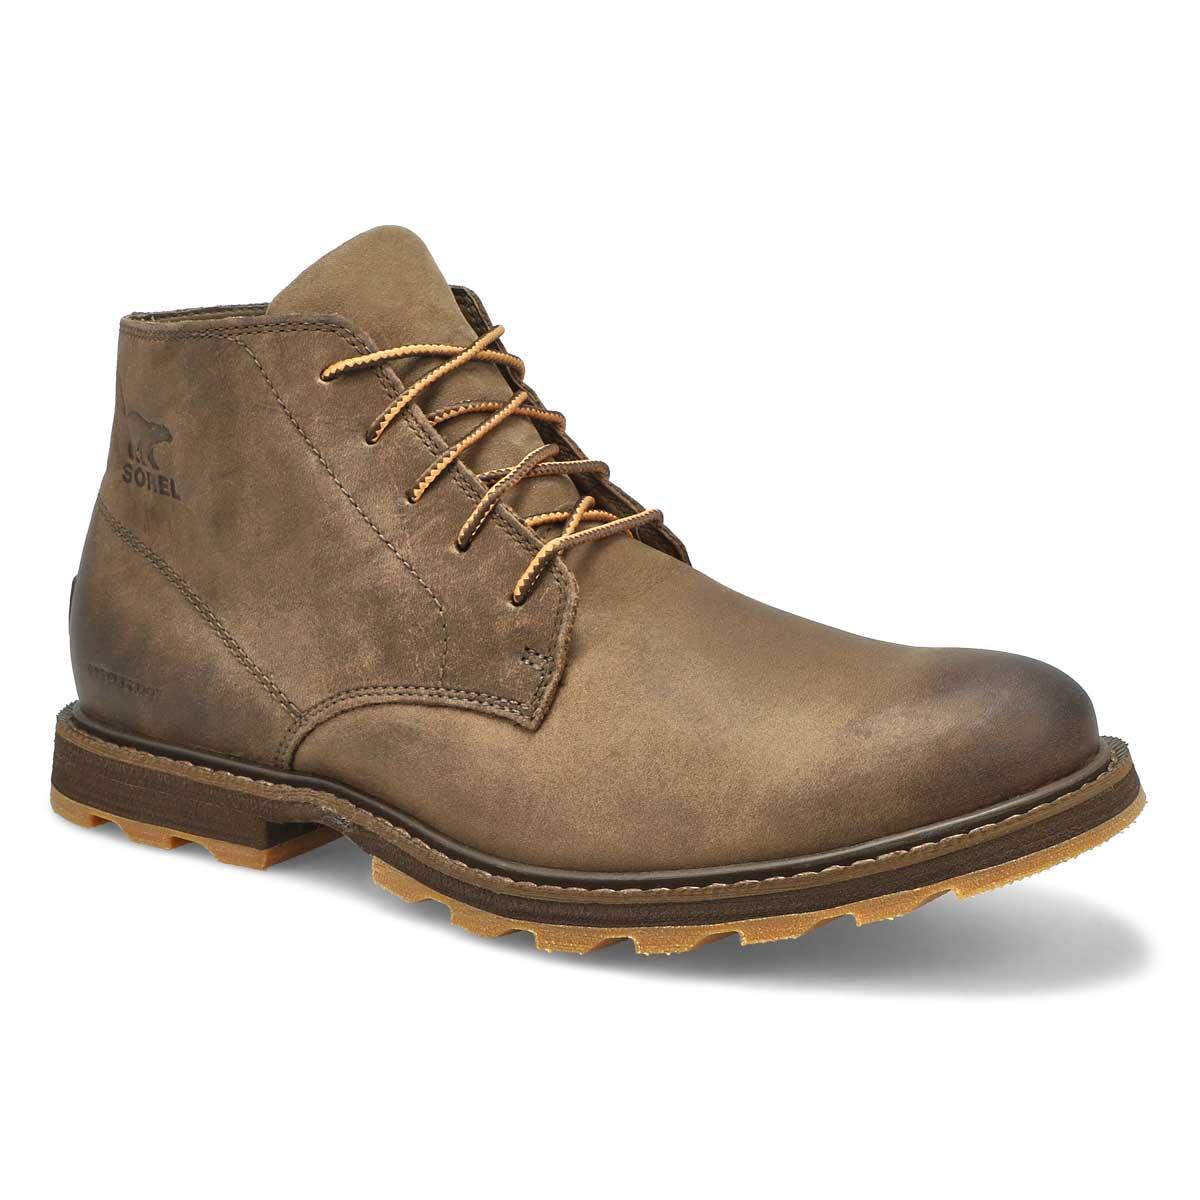 Men's MADSON major waterproof chukka boots